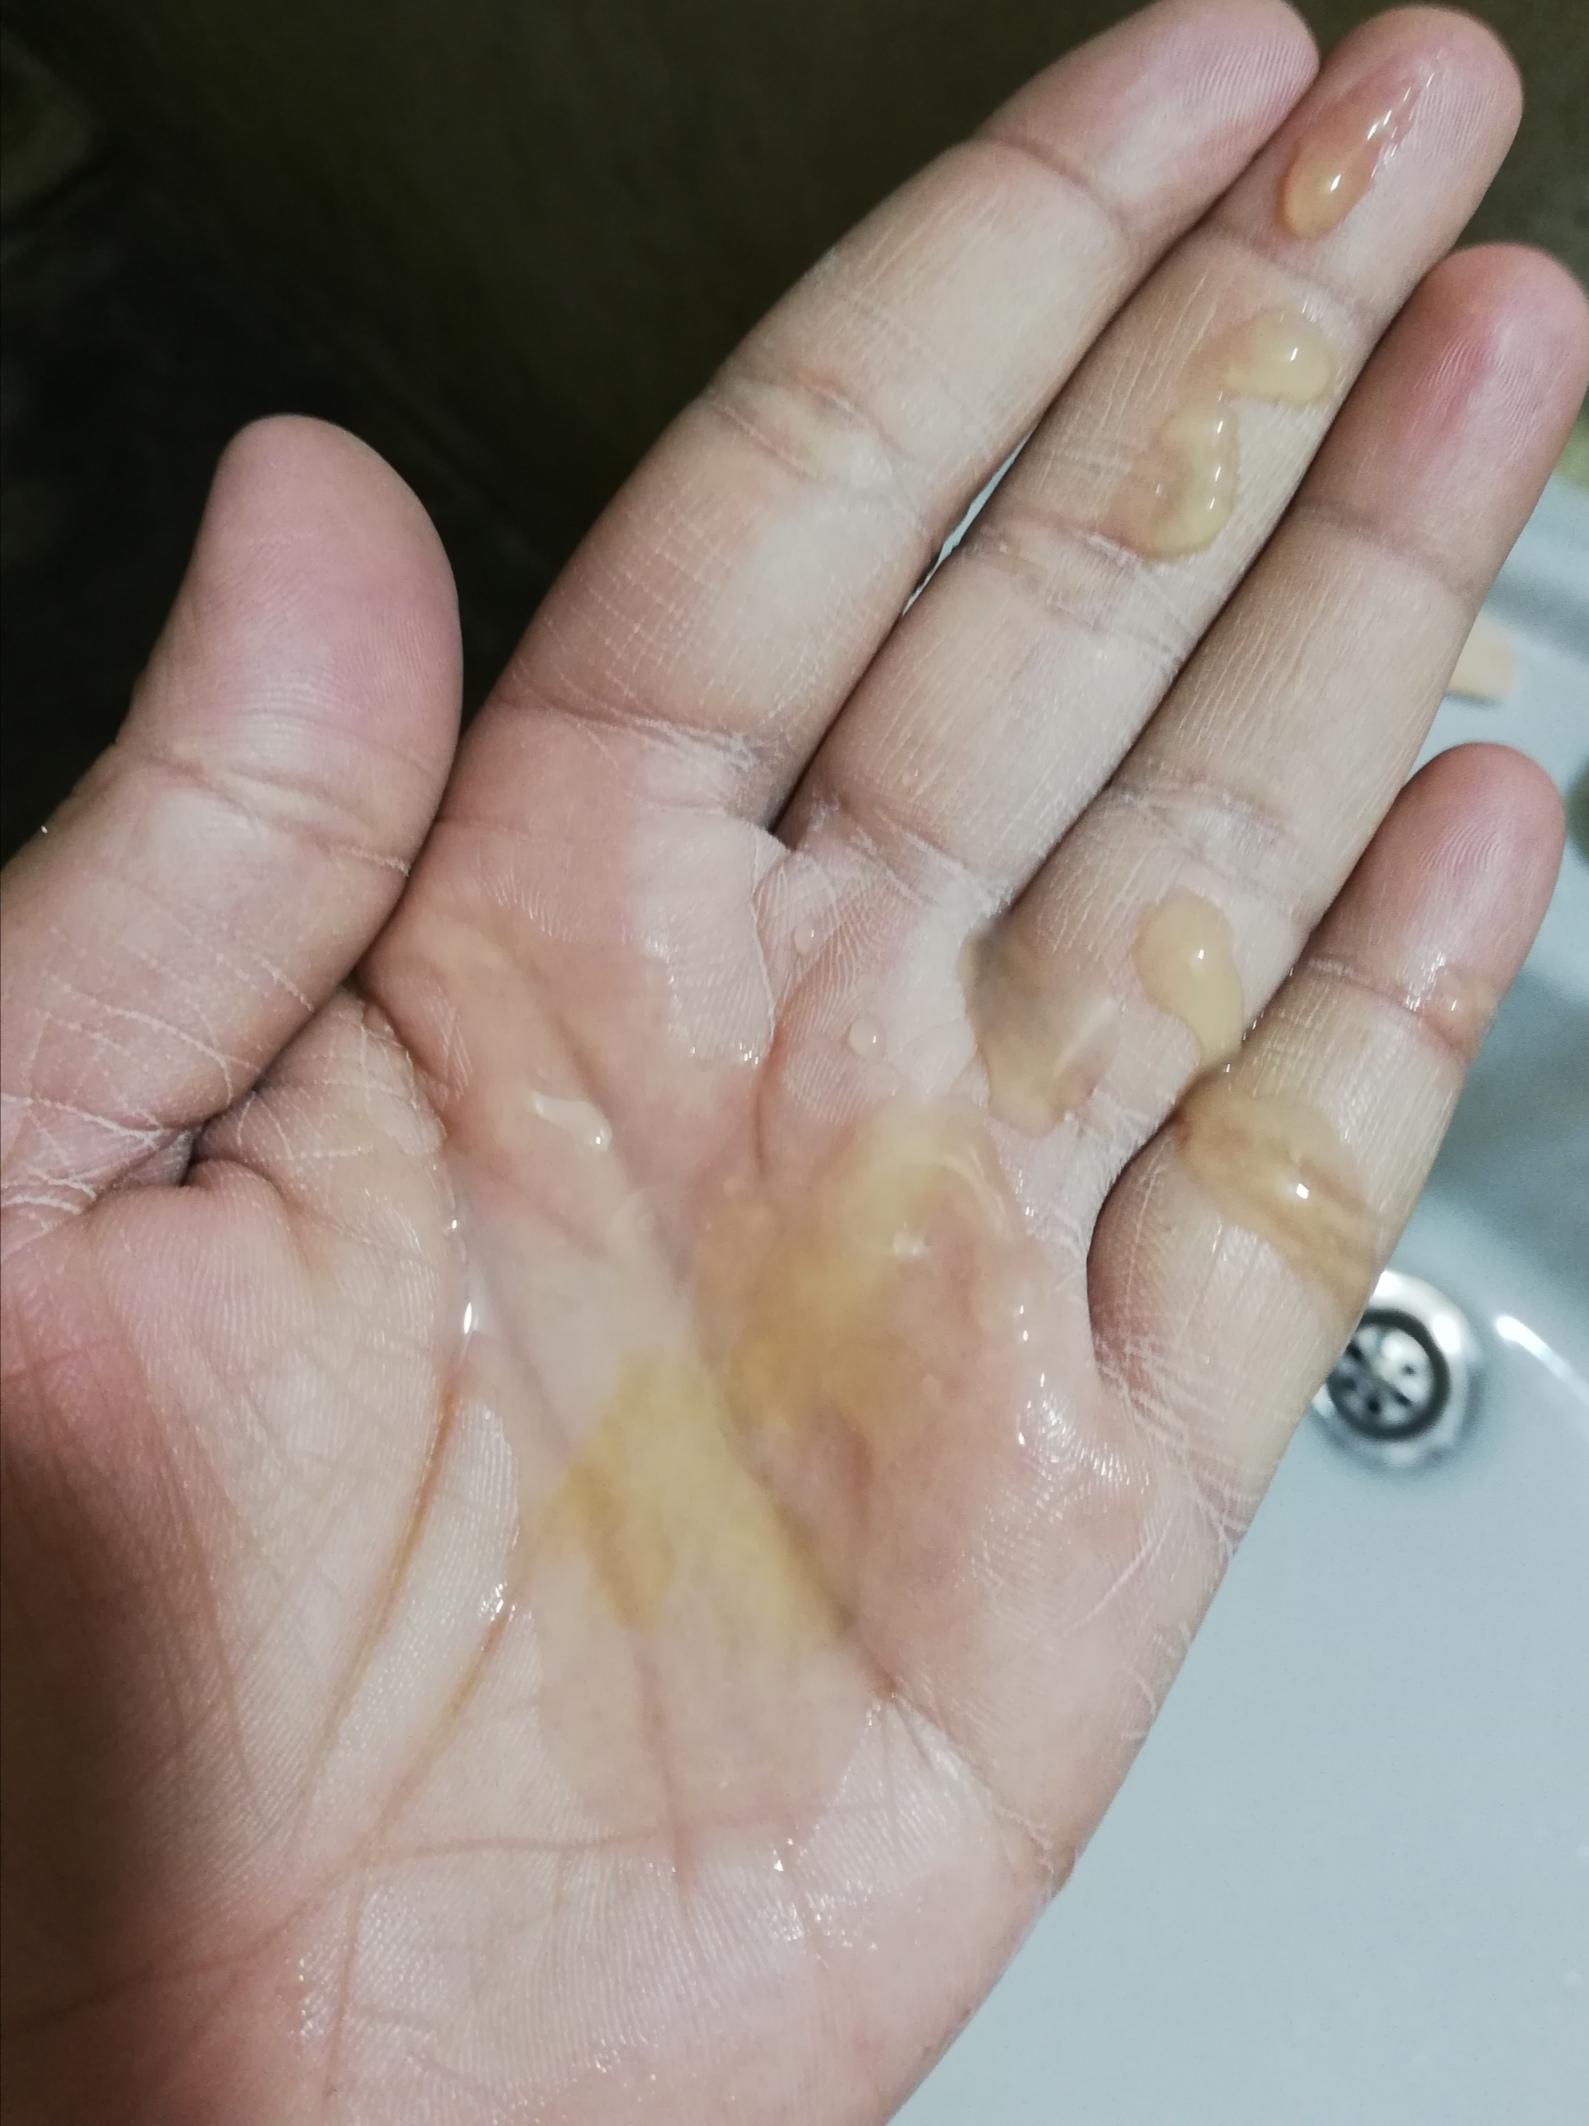 Ask a Urologist Online for Yellow Sperm